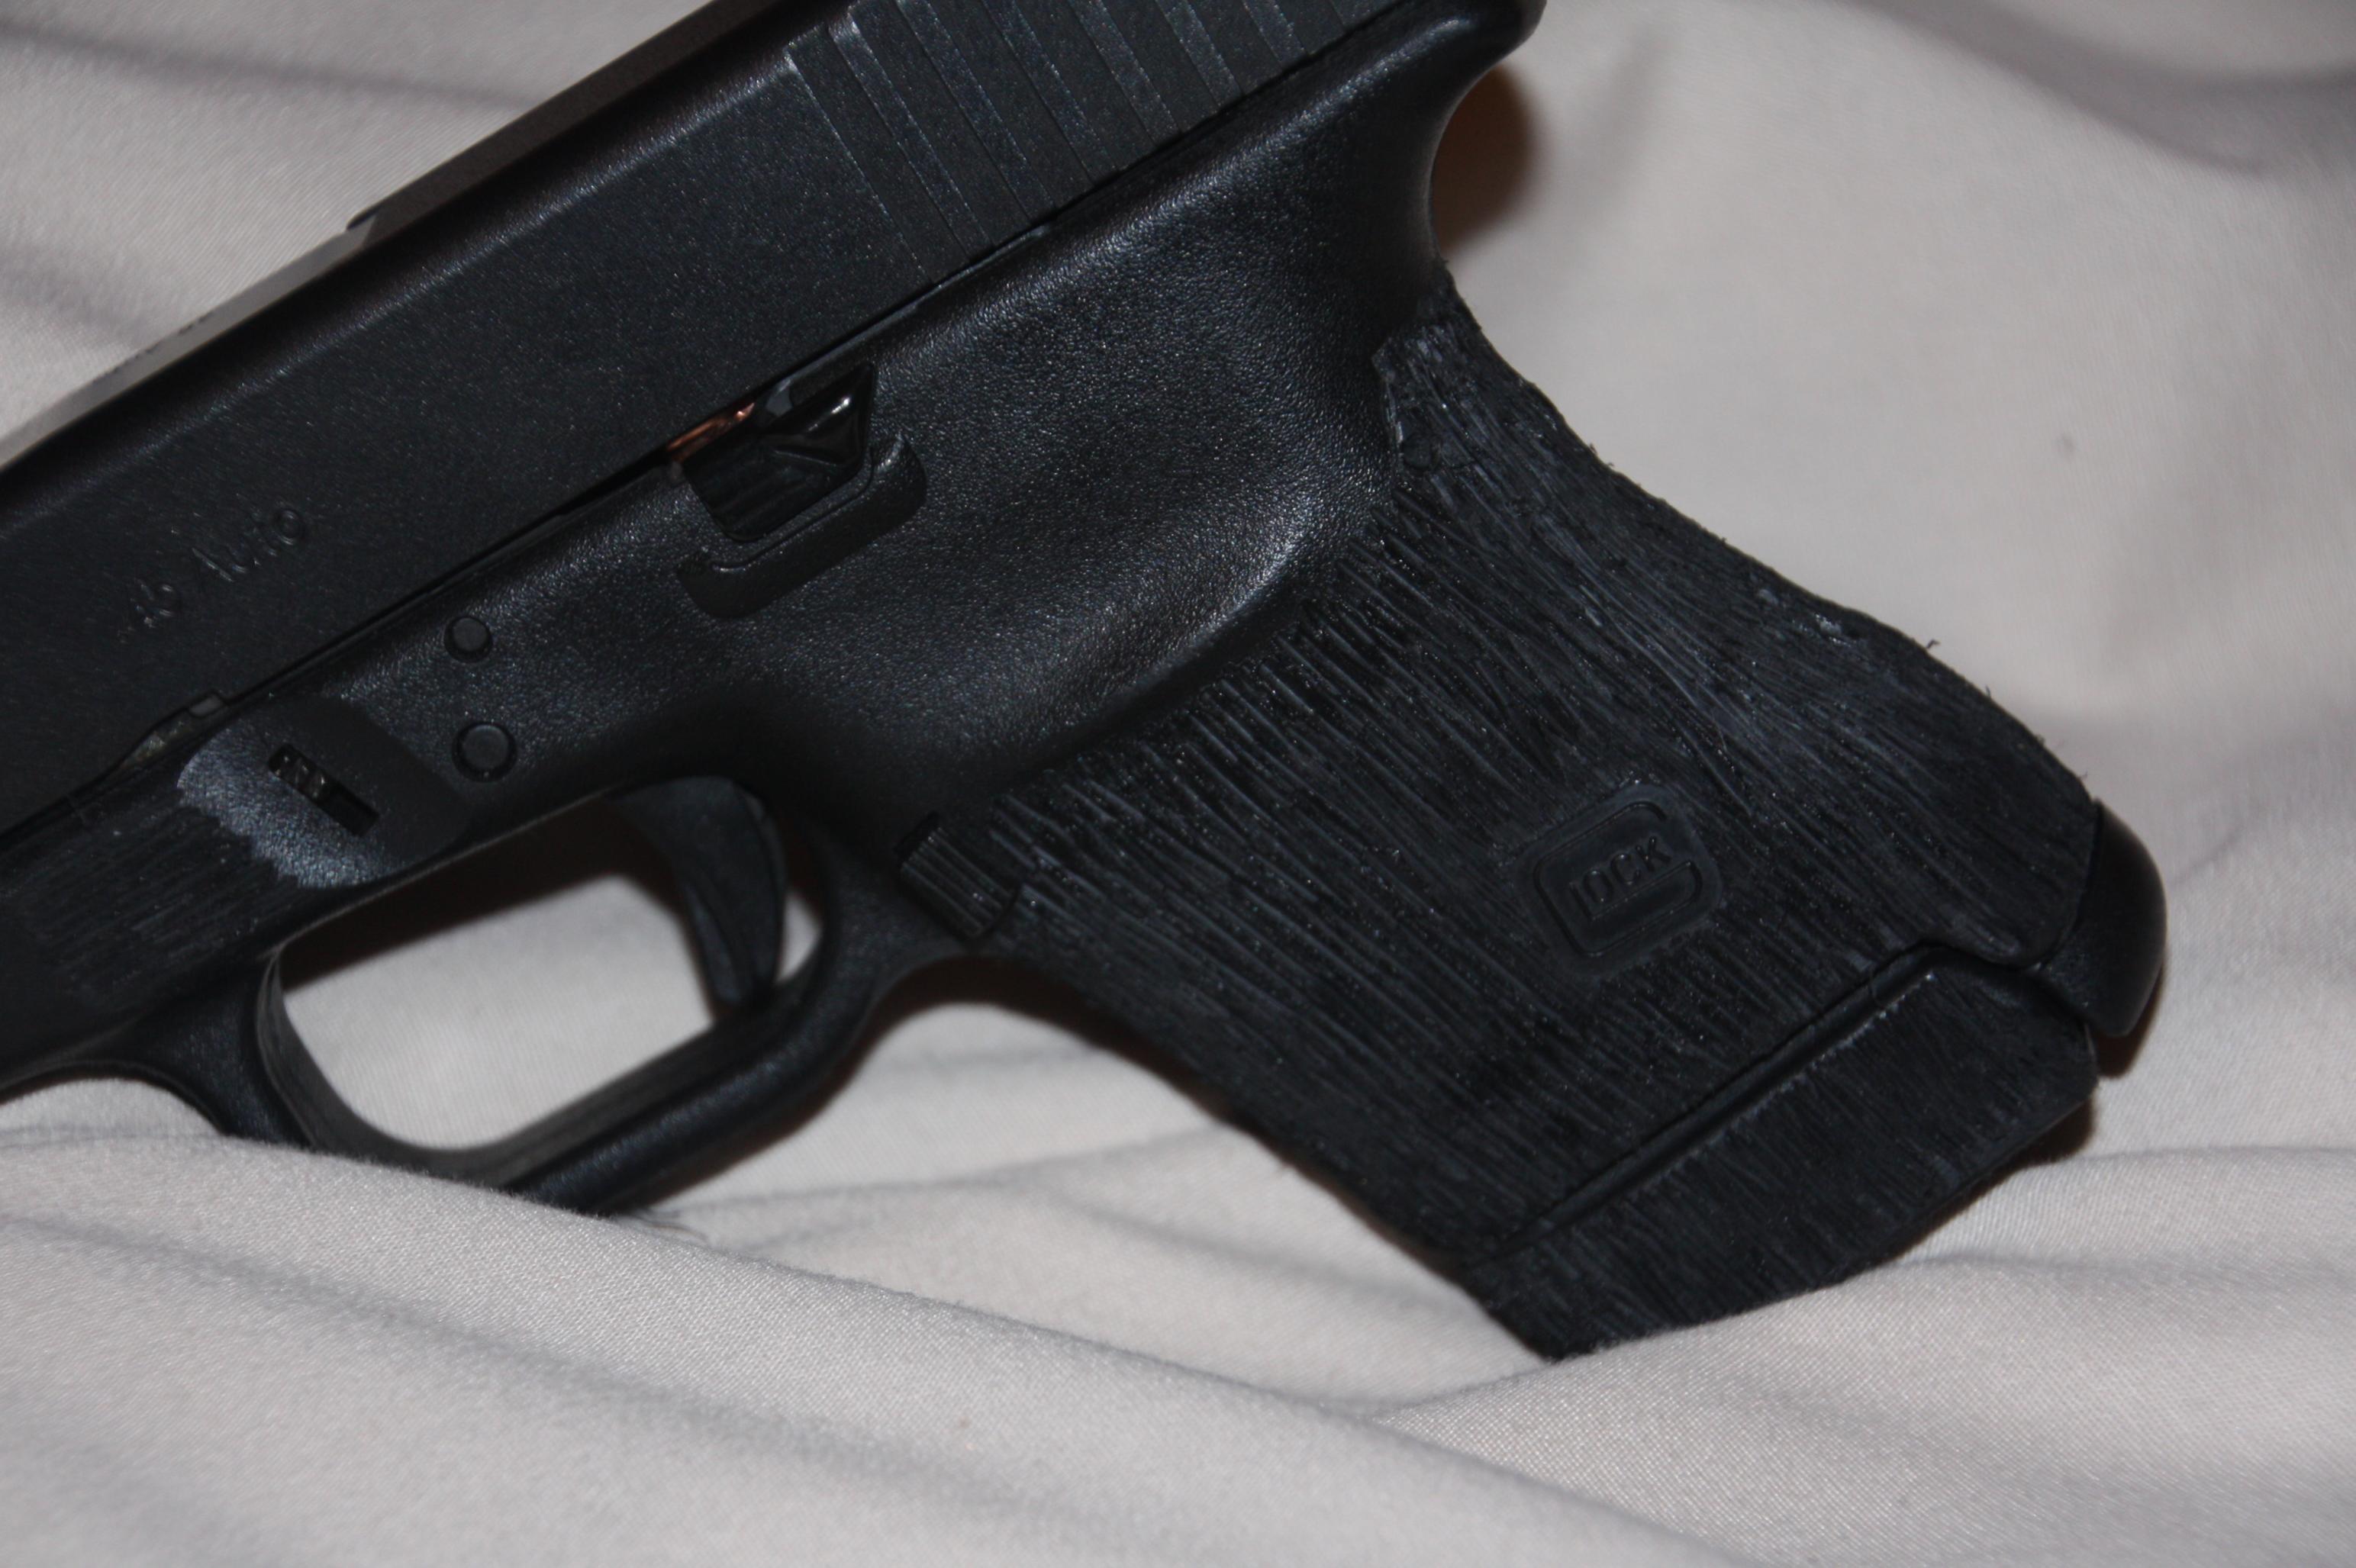 Glock 30/36 Hybrid - Glock 30S-img_0009.jpg